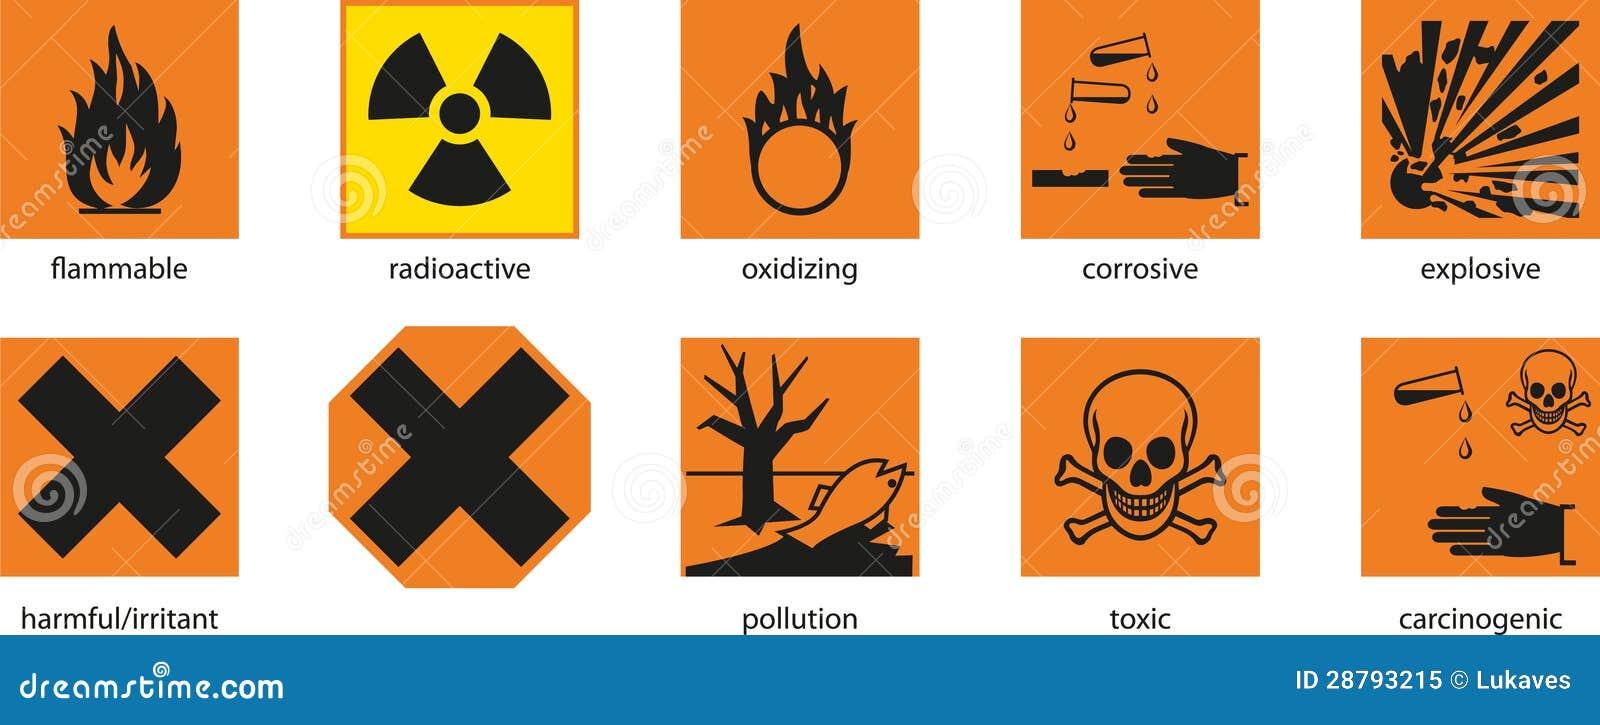 Lab Safety Worksheet 005 - Lab Safety Worksheet